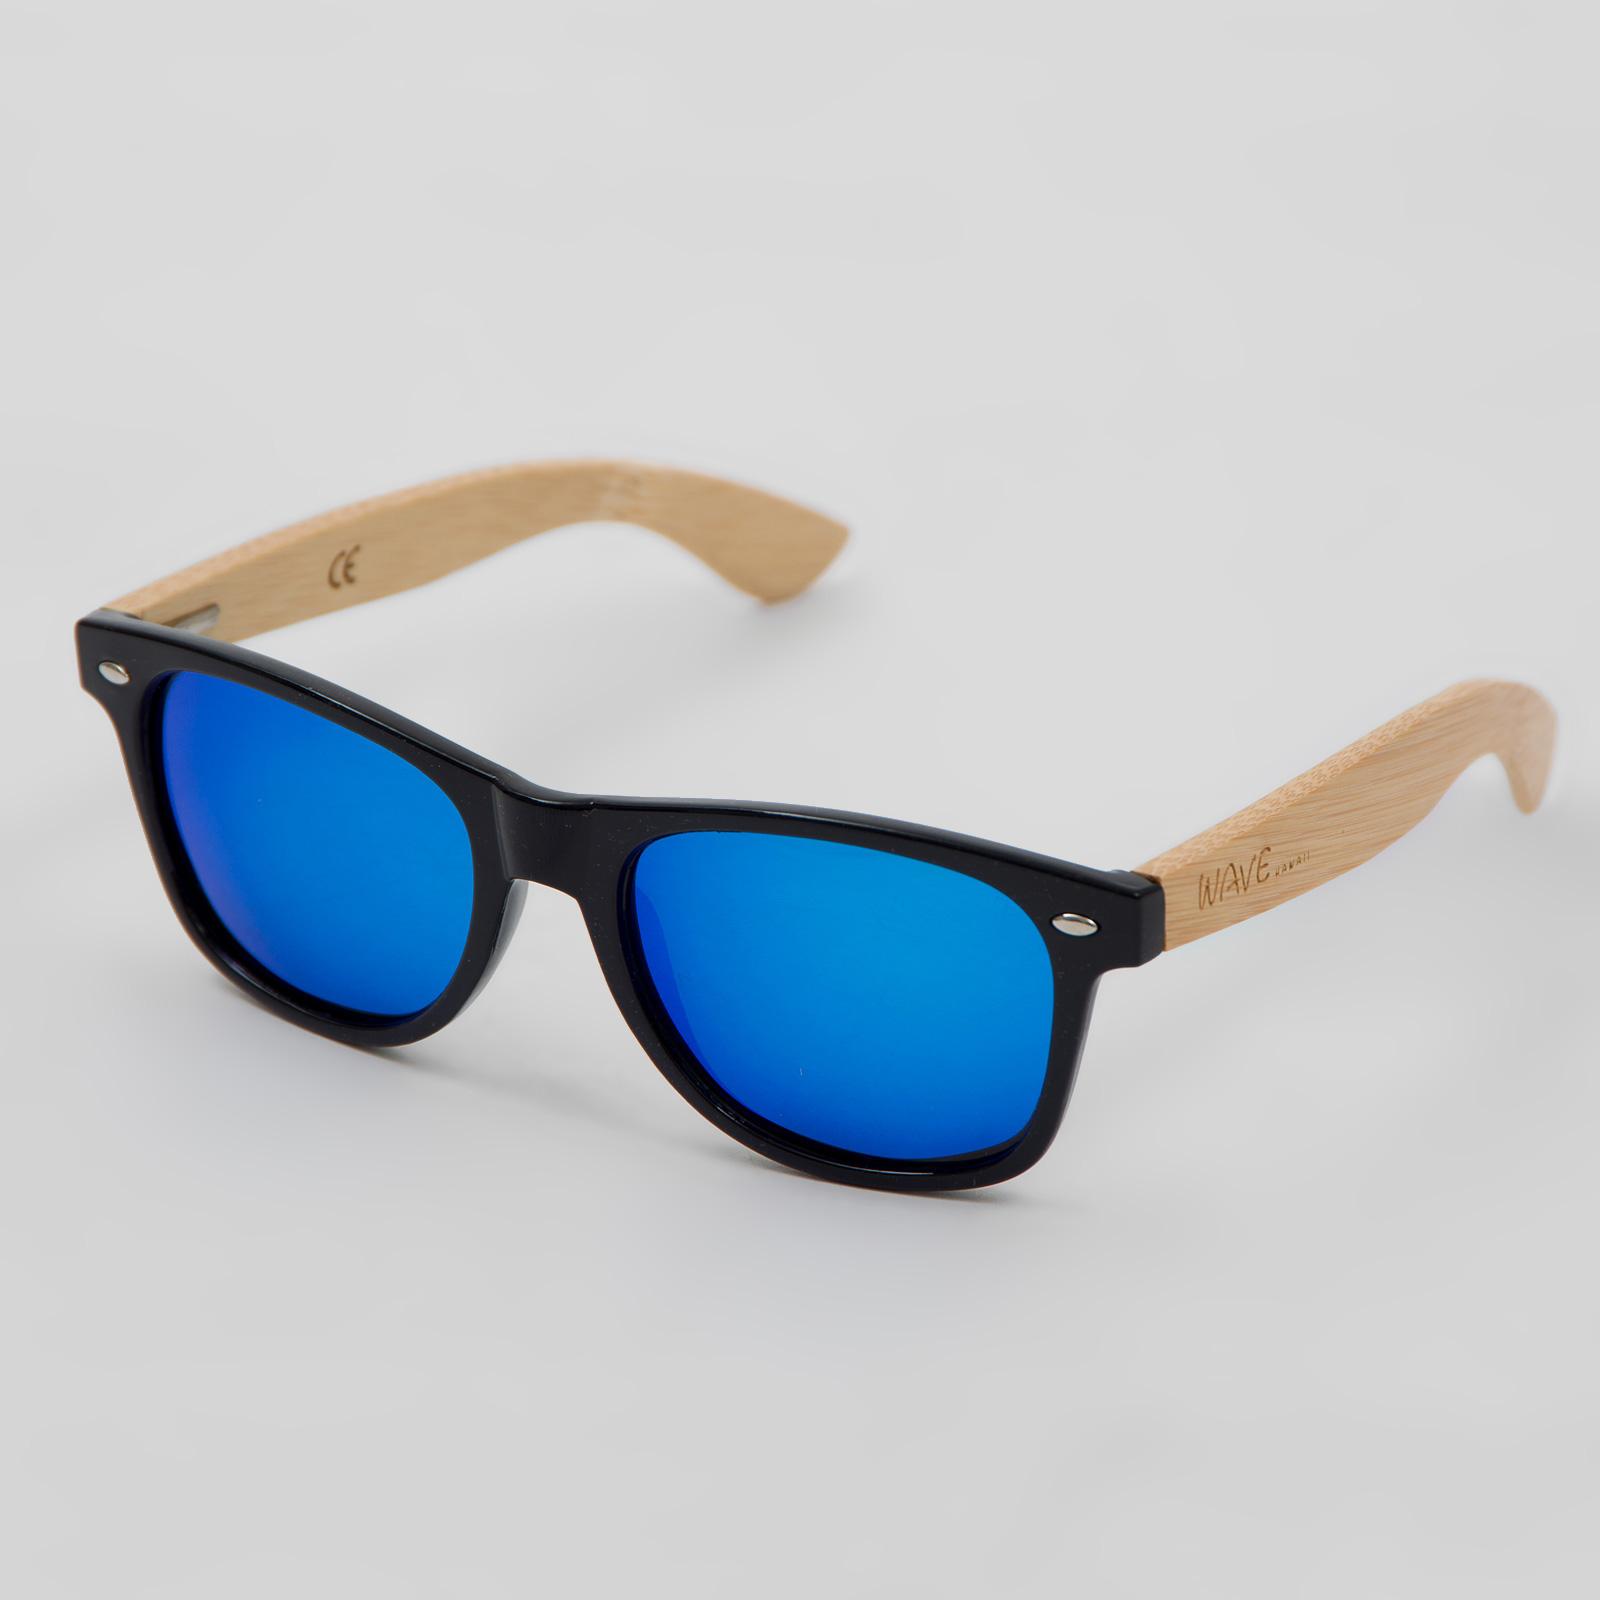 sonnenbrille nerdbrille bamboo diabolo farbe schwarz blau. Black Bedroom Furniture Sets. Home Design Ideas